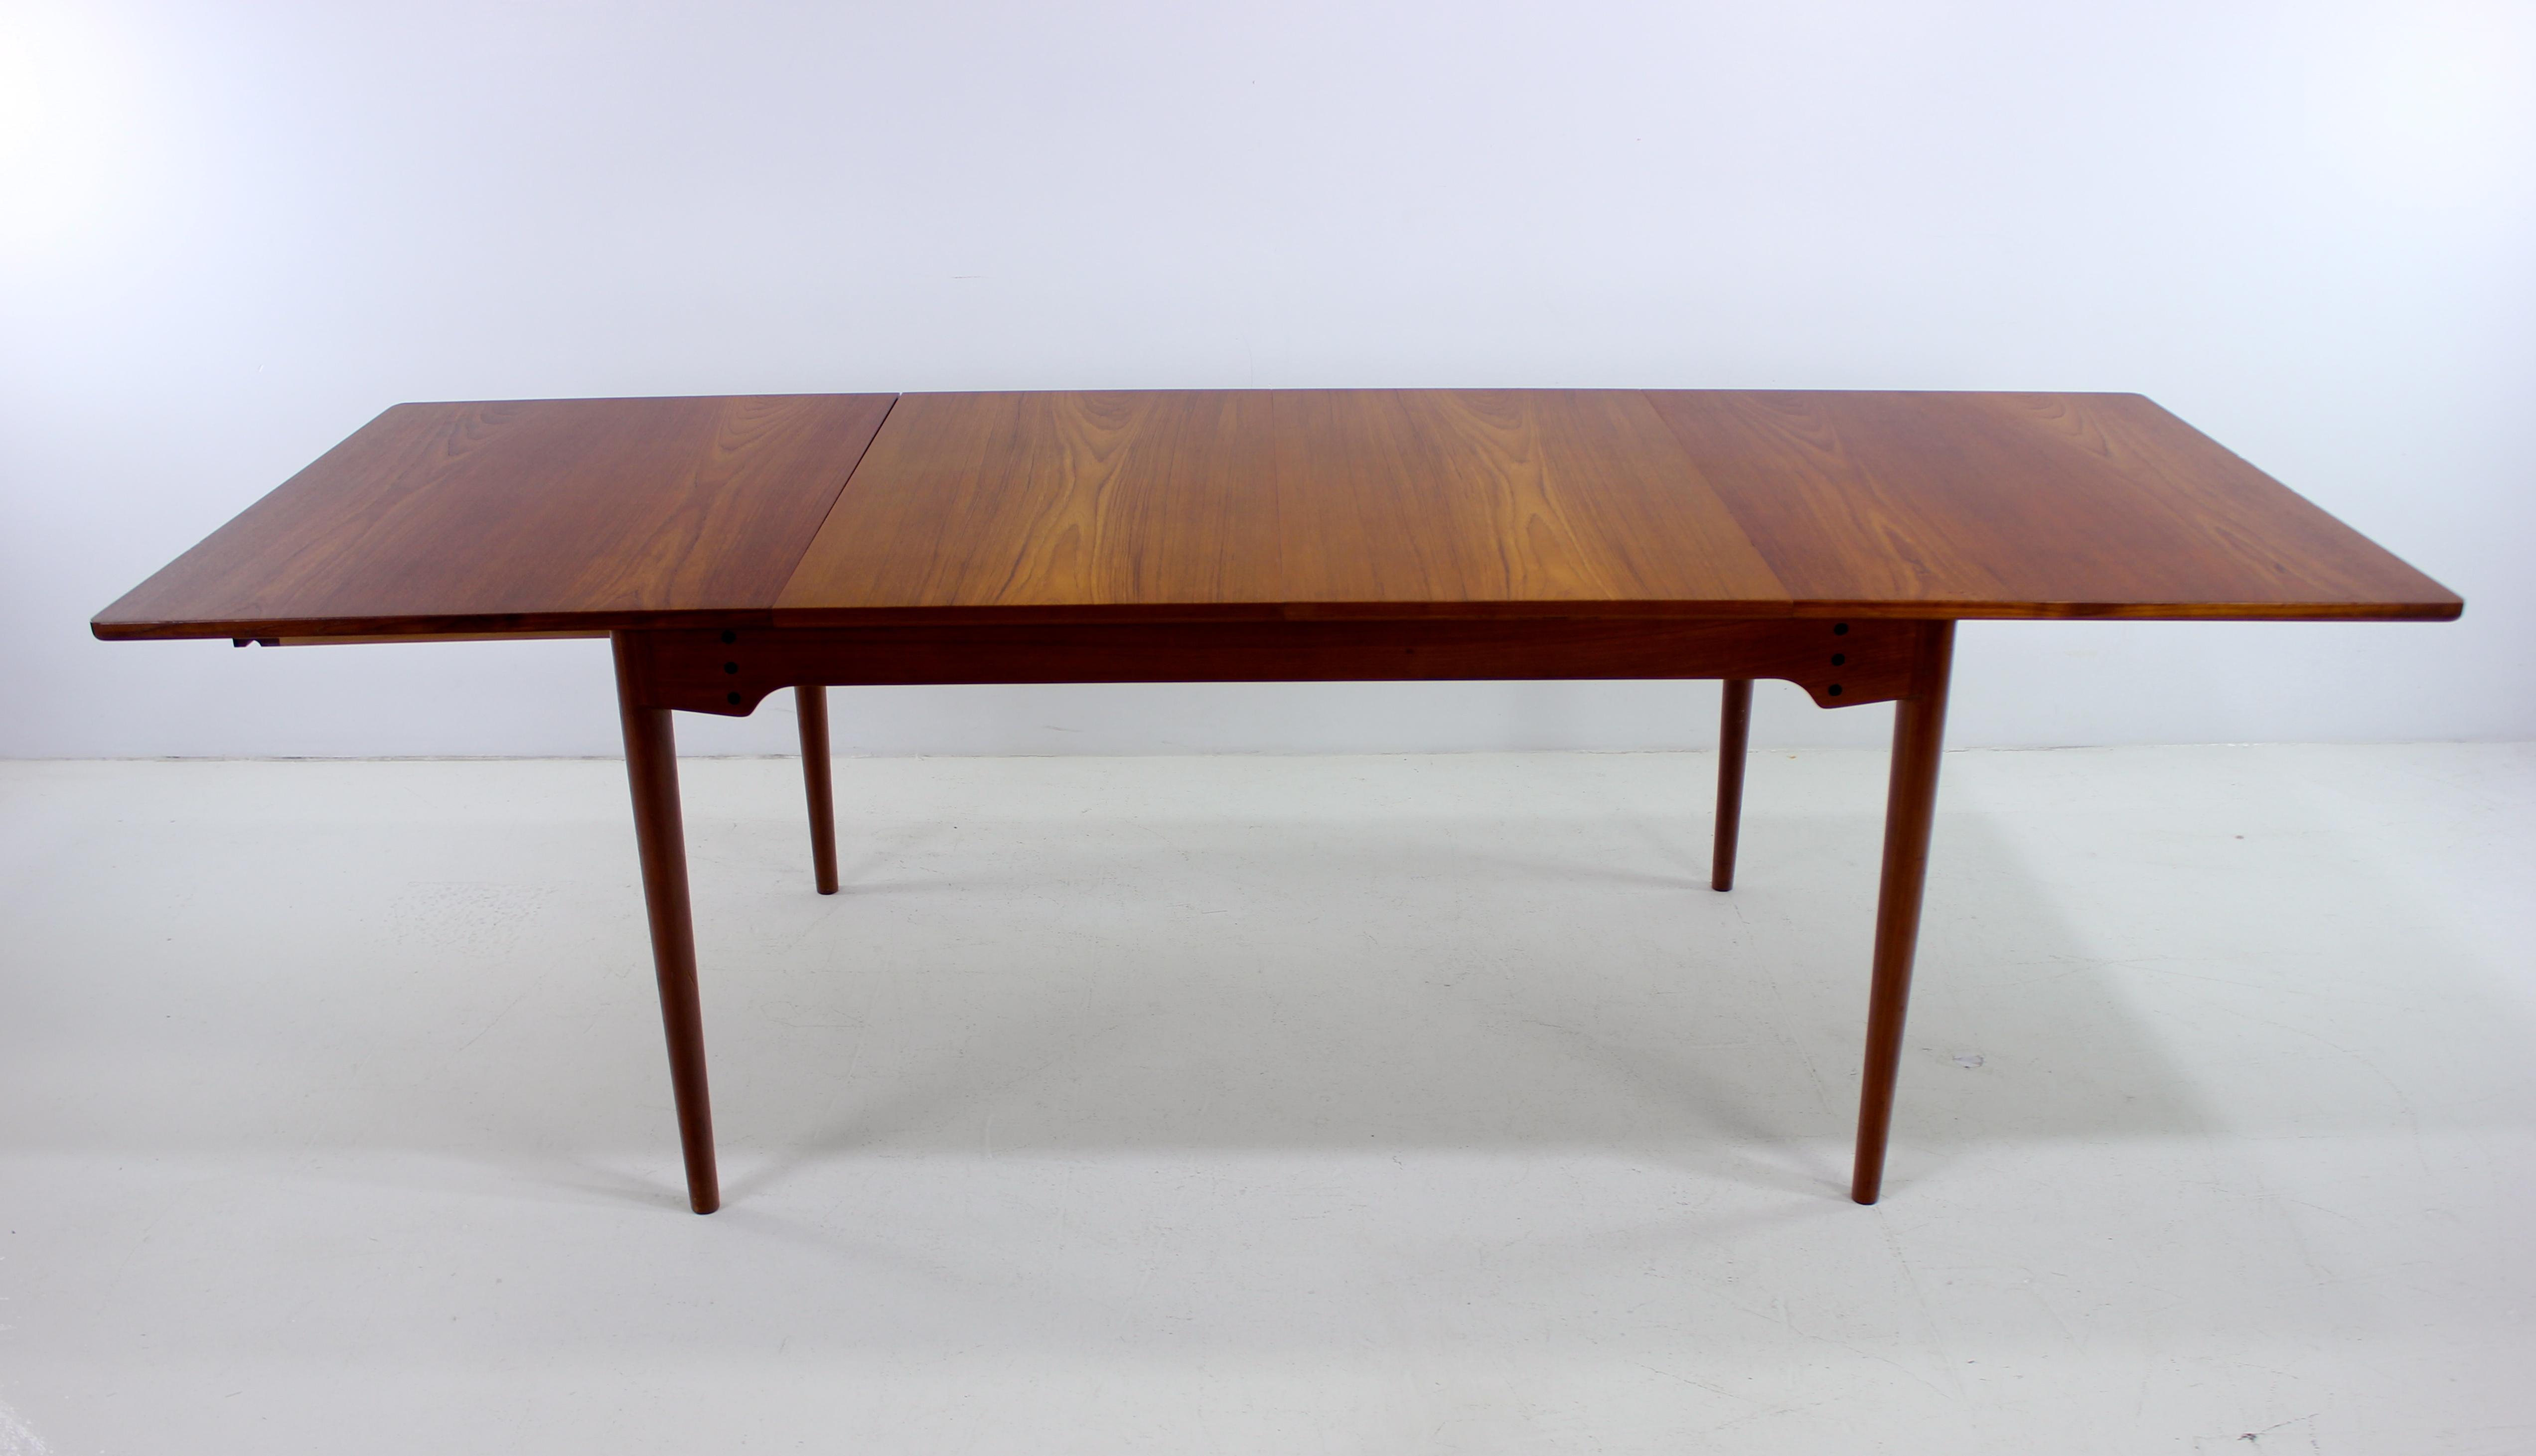 Brilliant Danish Modern Teak Dining Table Designed By Finn Juhl Pabps2019 Chair Design Images Pabps2019Com